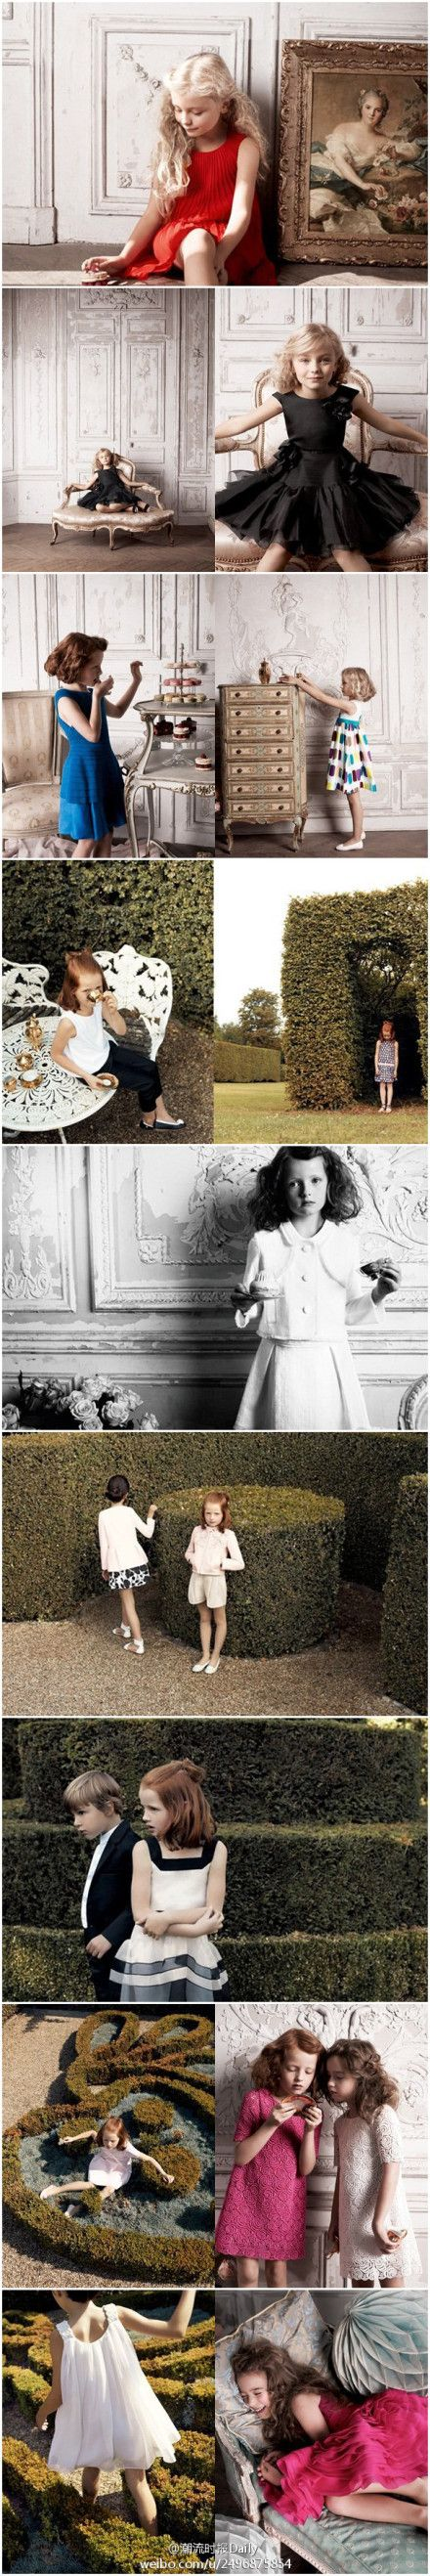 Baby Dior 2013 Summer lookbook